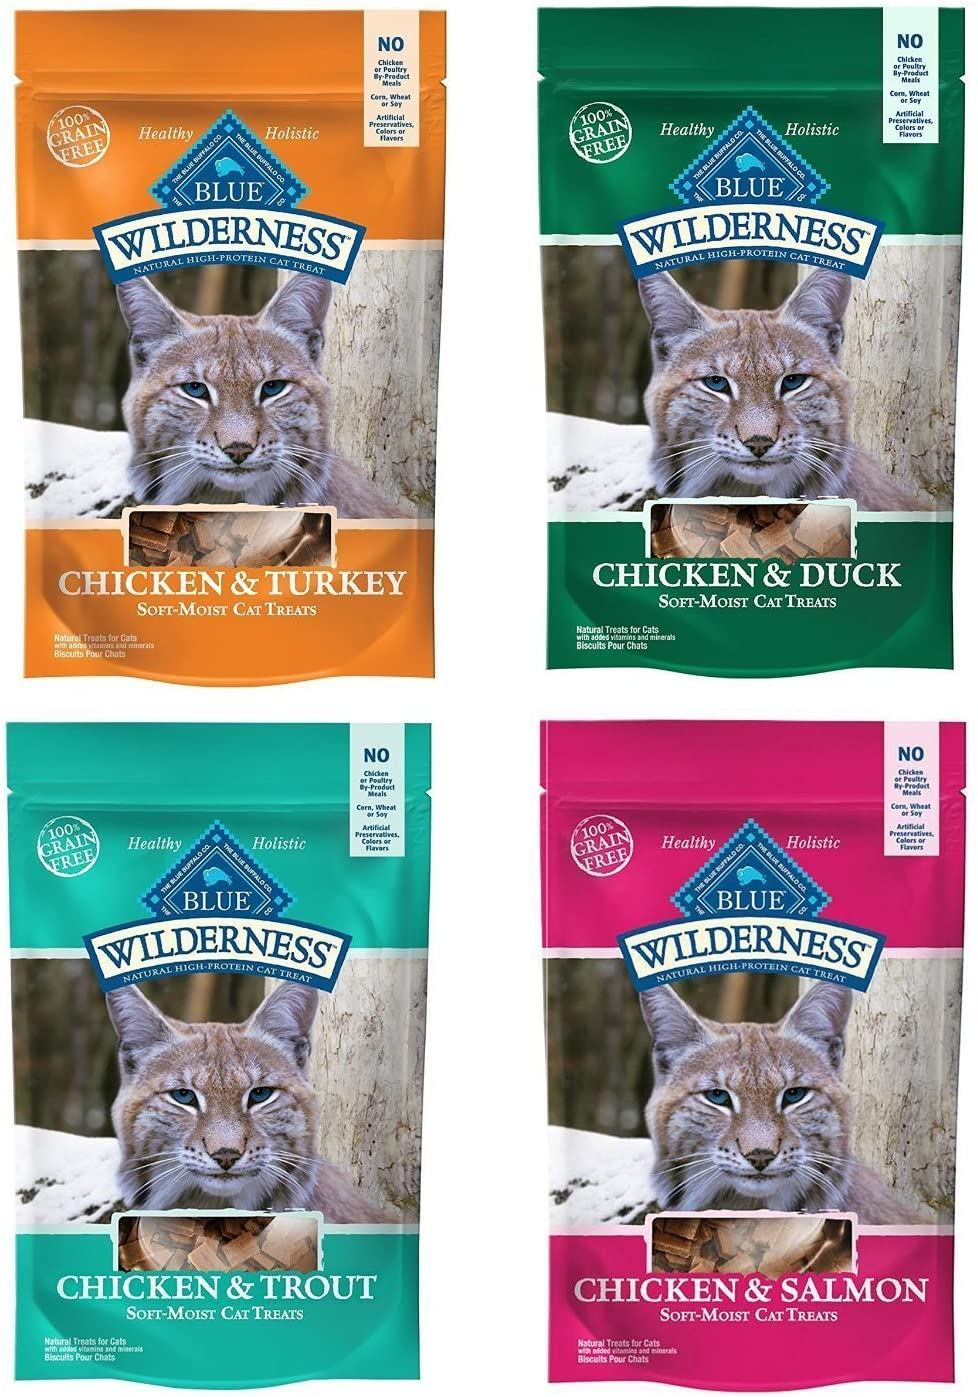 Blue Buffalo Wilderness Soft-Moist Grain-Free Cat Treats